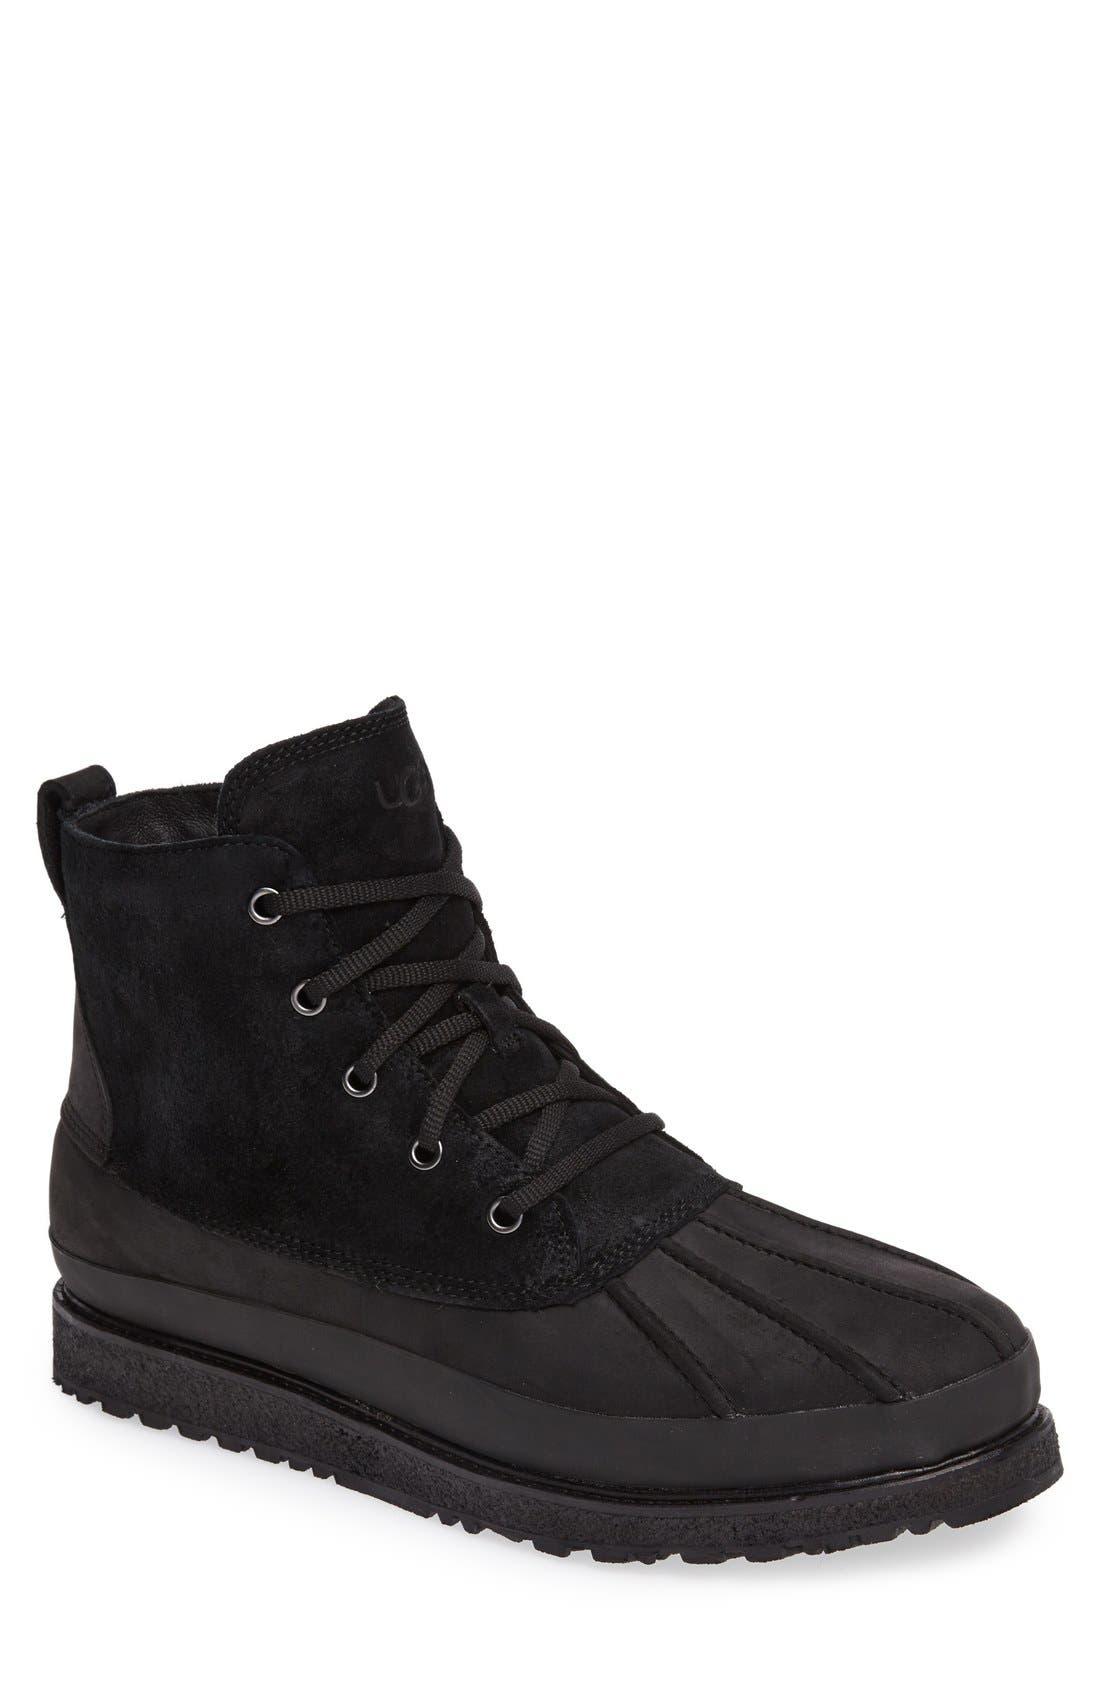 Alternate Image 1 Selected - UGG® Fairbanks Waterproof Boot (Men)